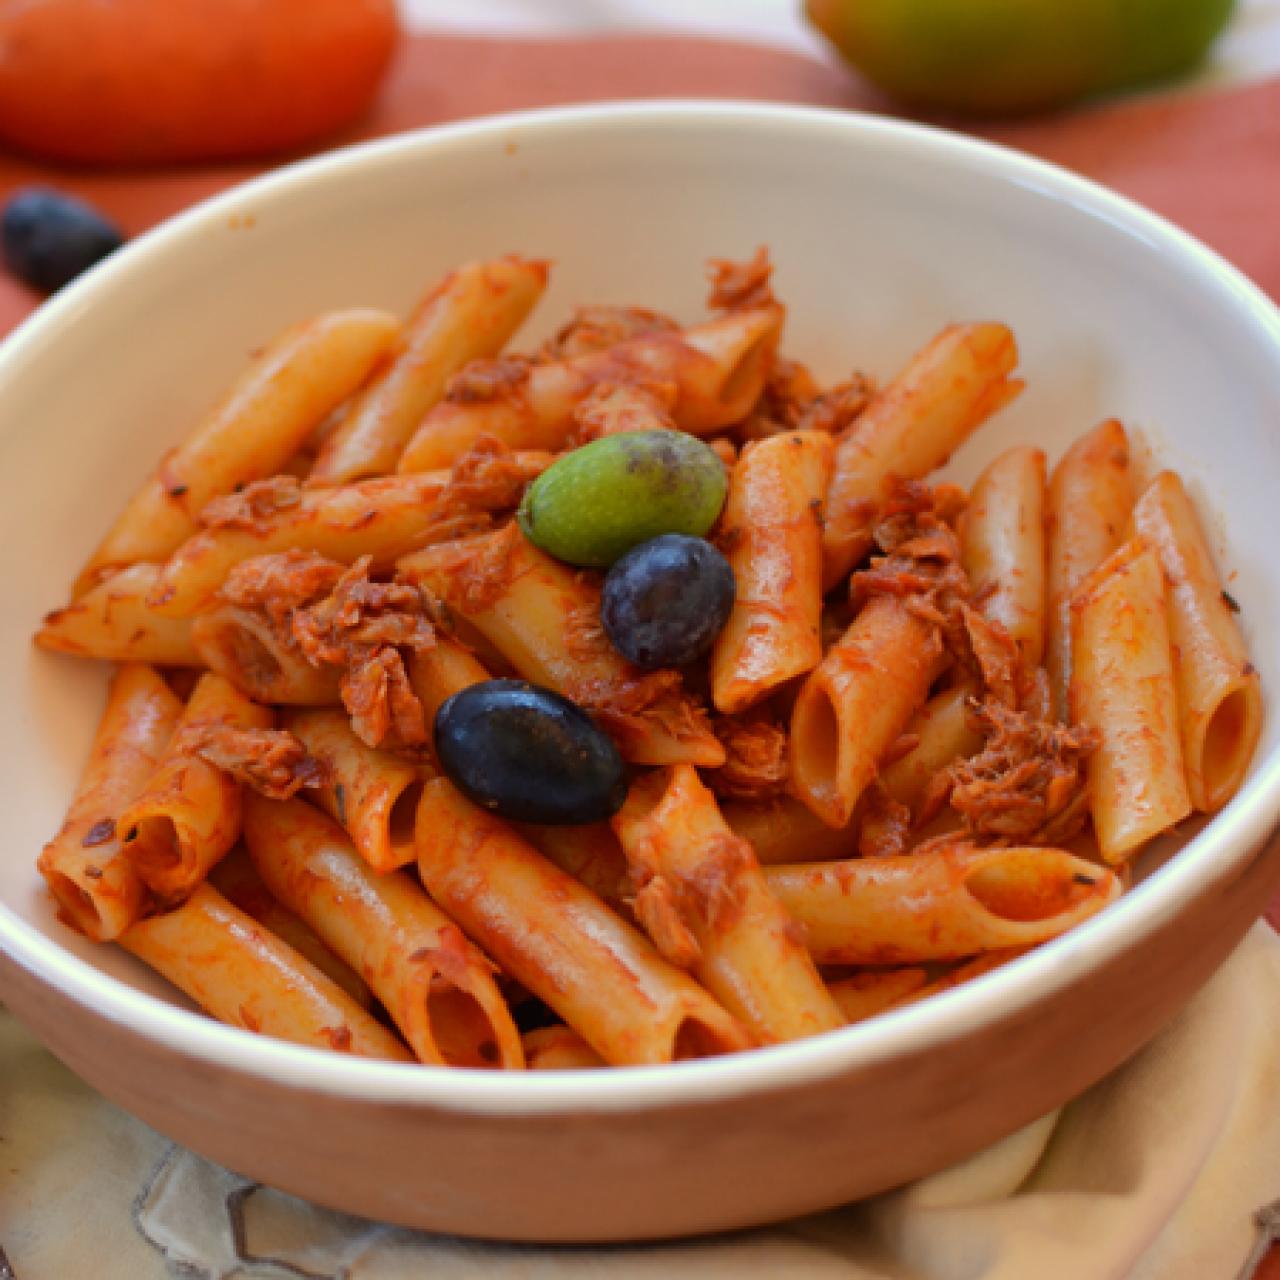 Zite allo sgombro con crema di peperoncino e olive fresche